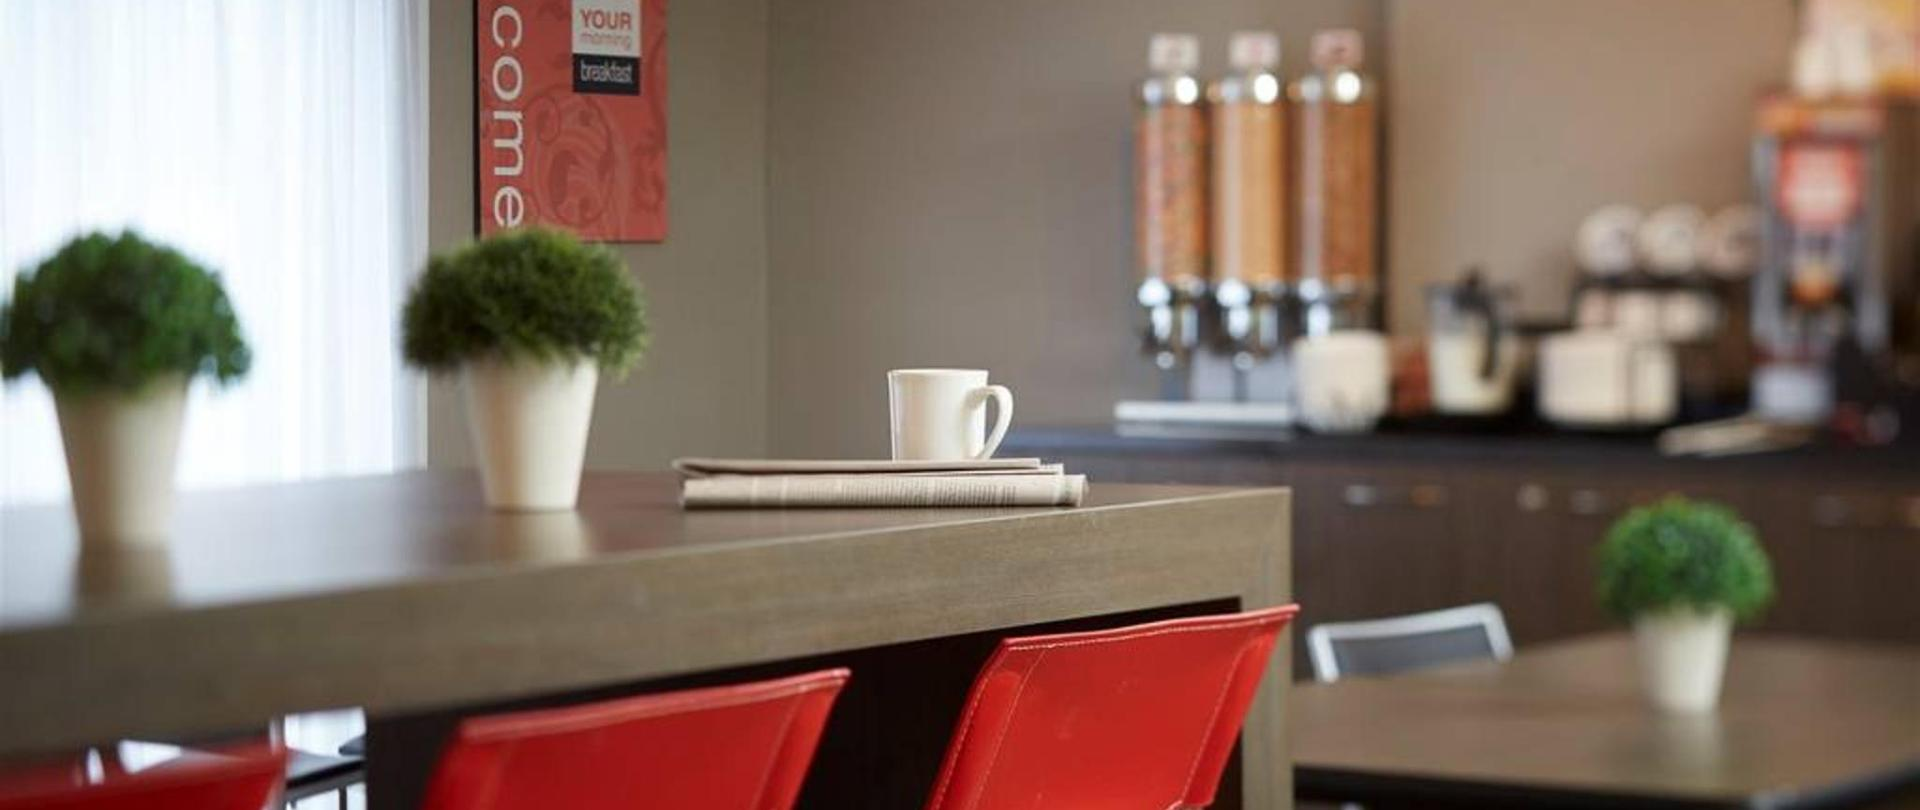 09-join-us-dans-le-petit-déjeuner-room.jpg.1024x0.jpg